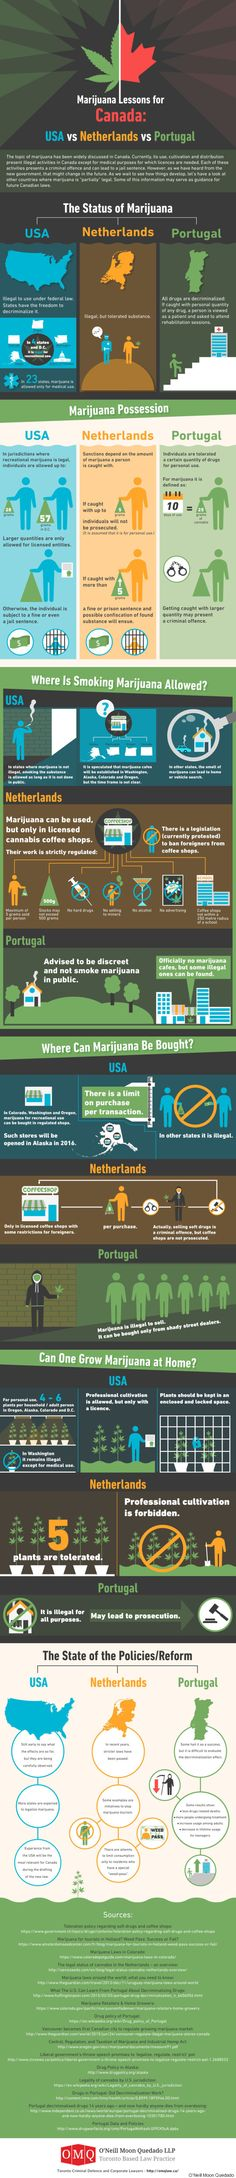 High Quality Marijuana Infographics    -5280mosli.com -Organic Cannabis College-   Top Shelf Marijuana   Cannabis Information Library